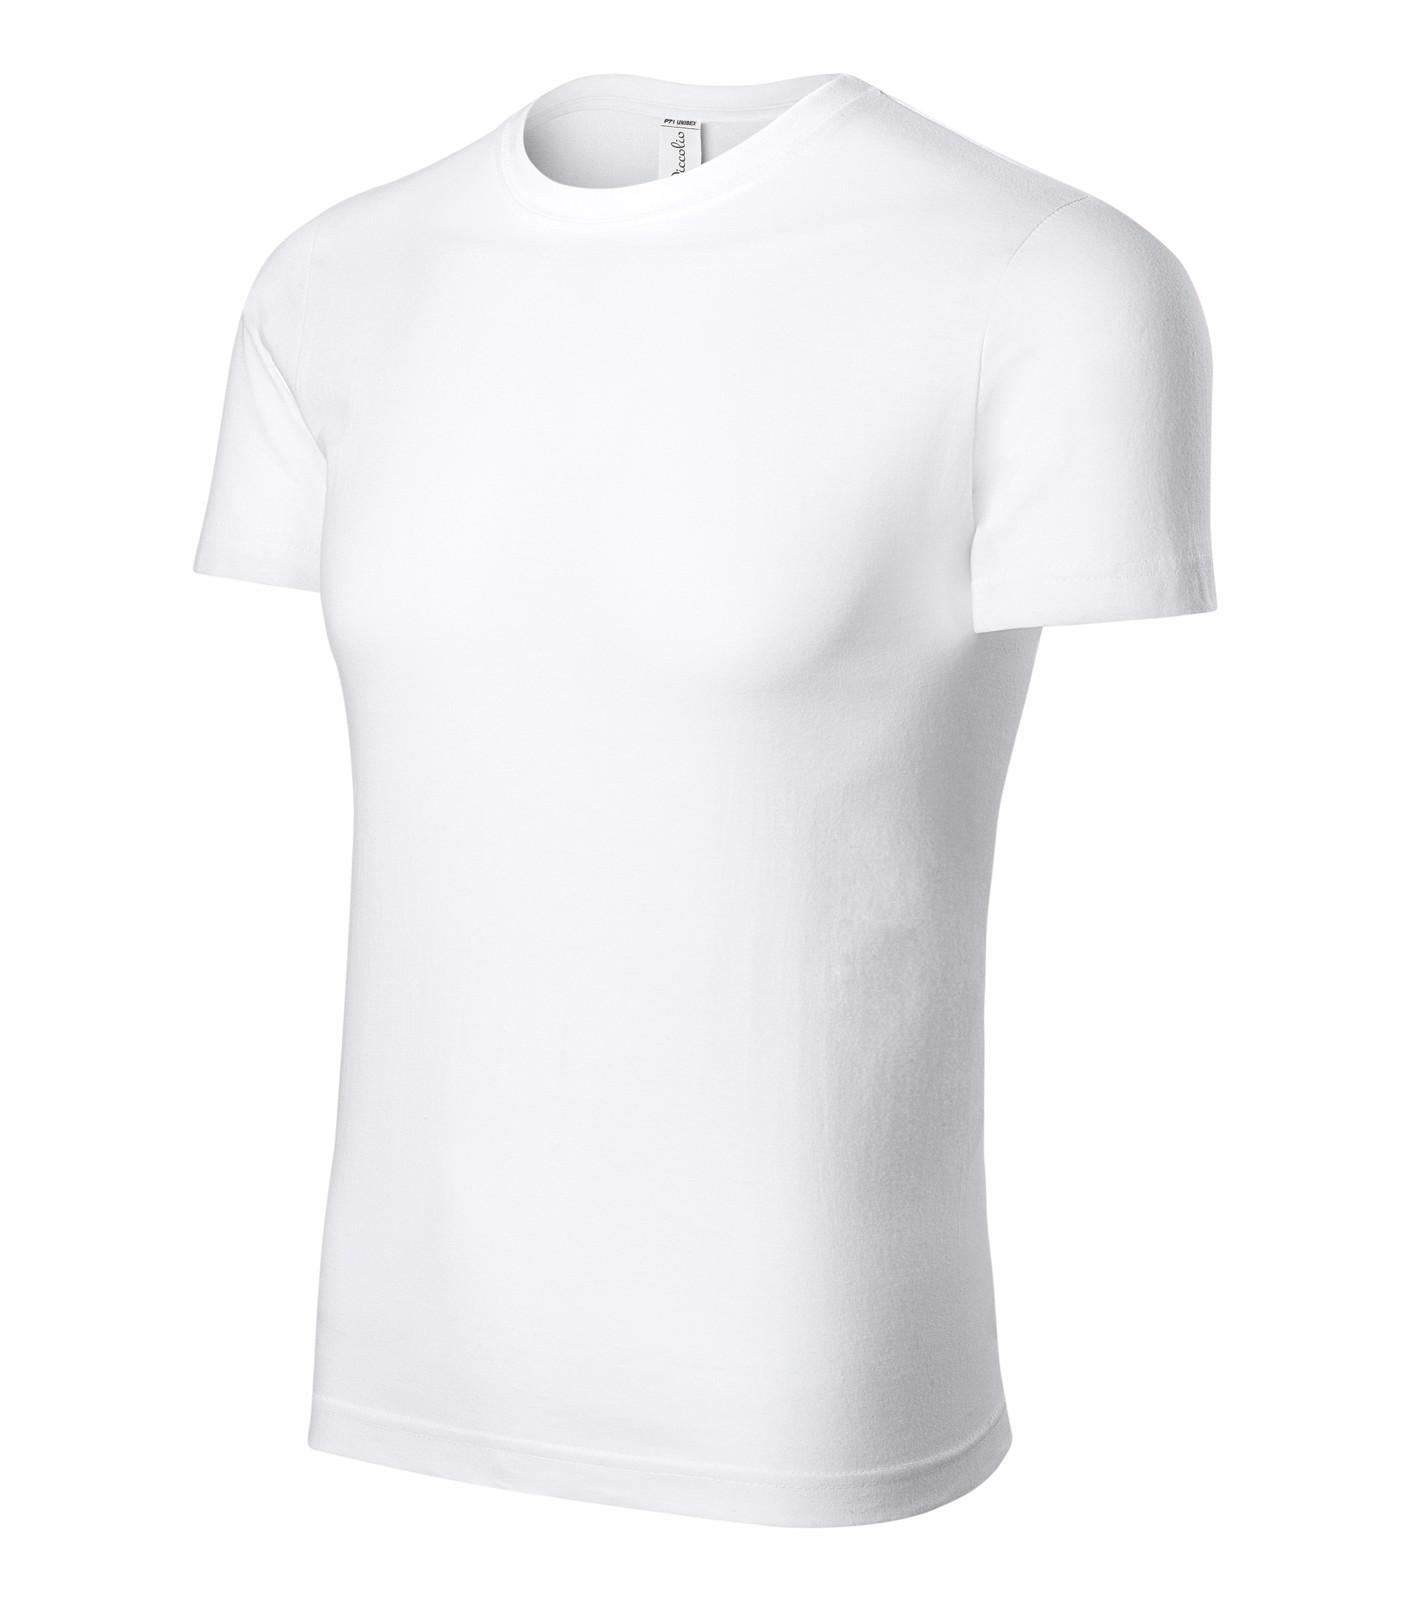 T-shirt unisex Piccolio Parade - White / XS